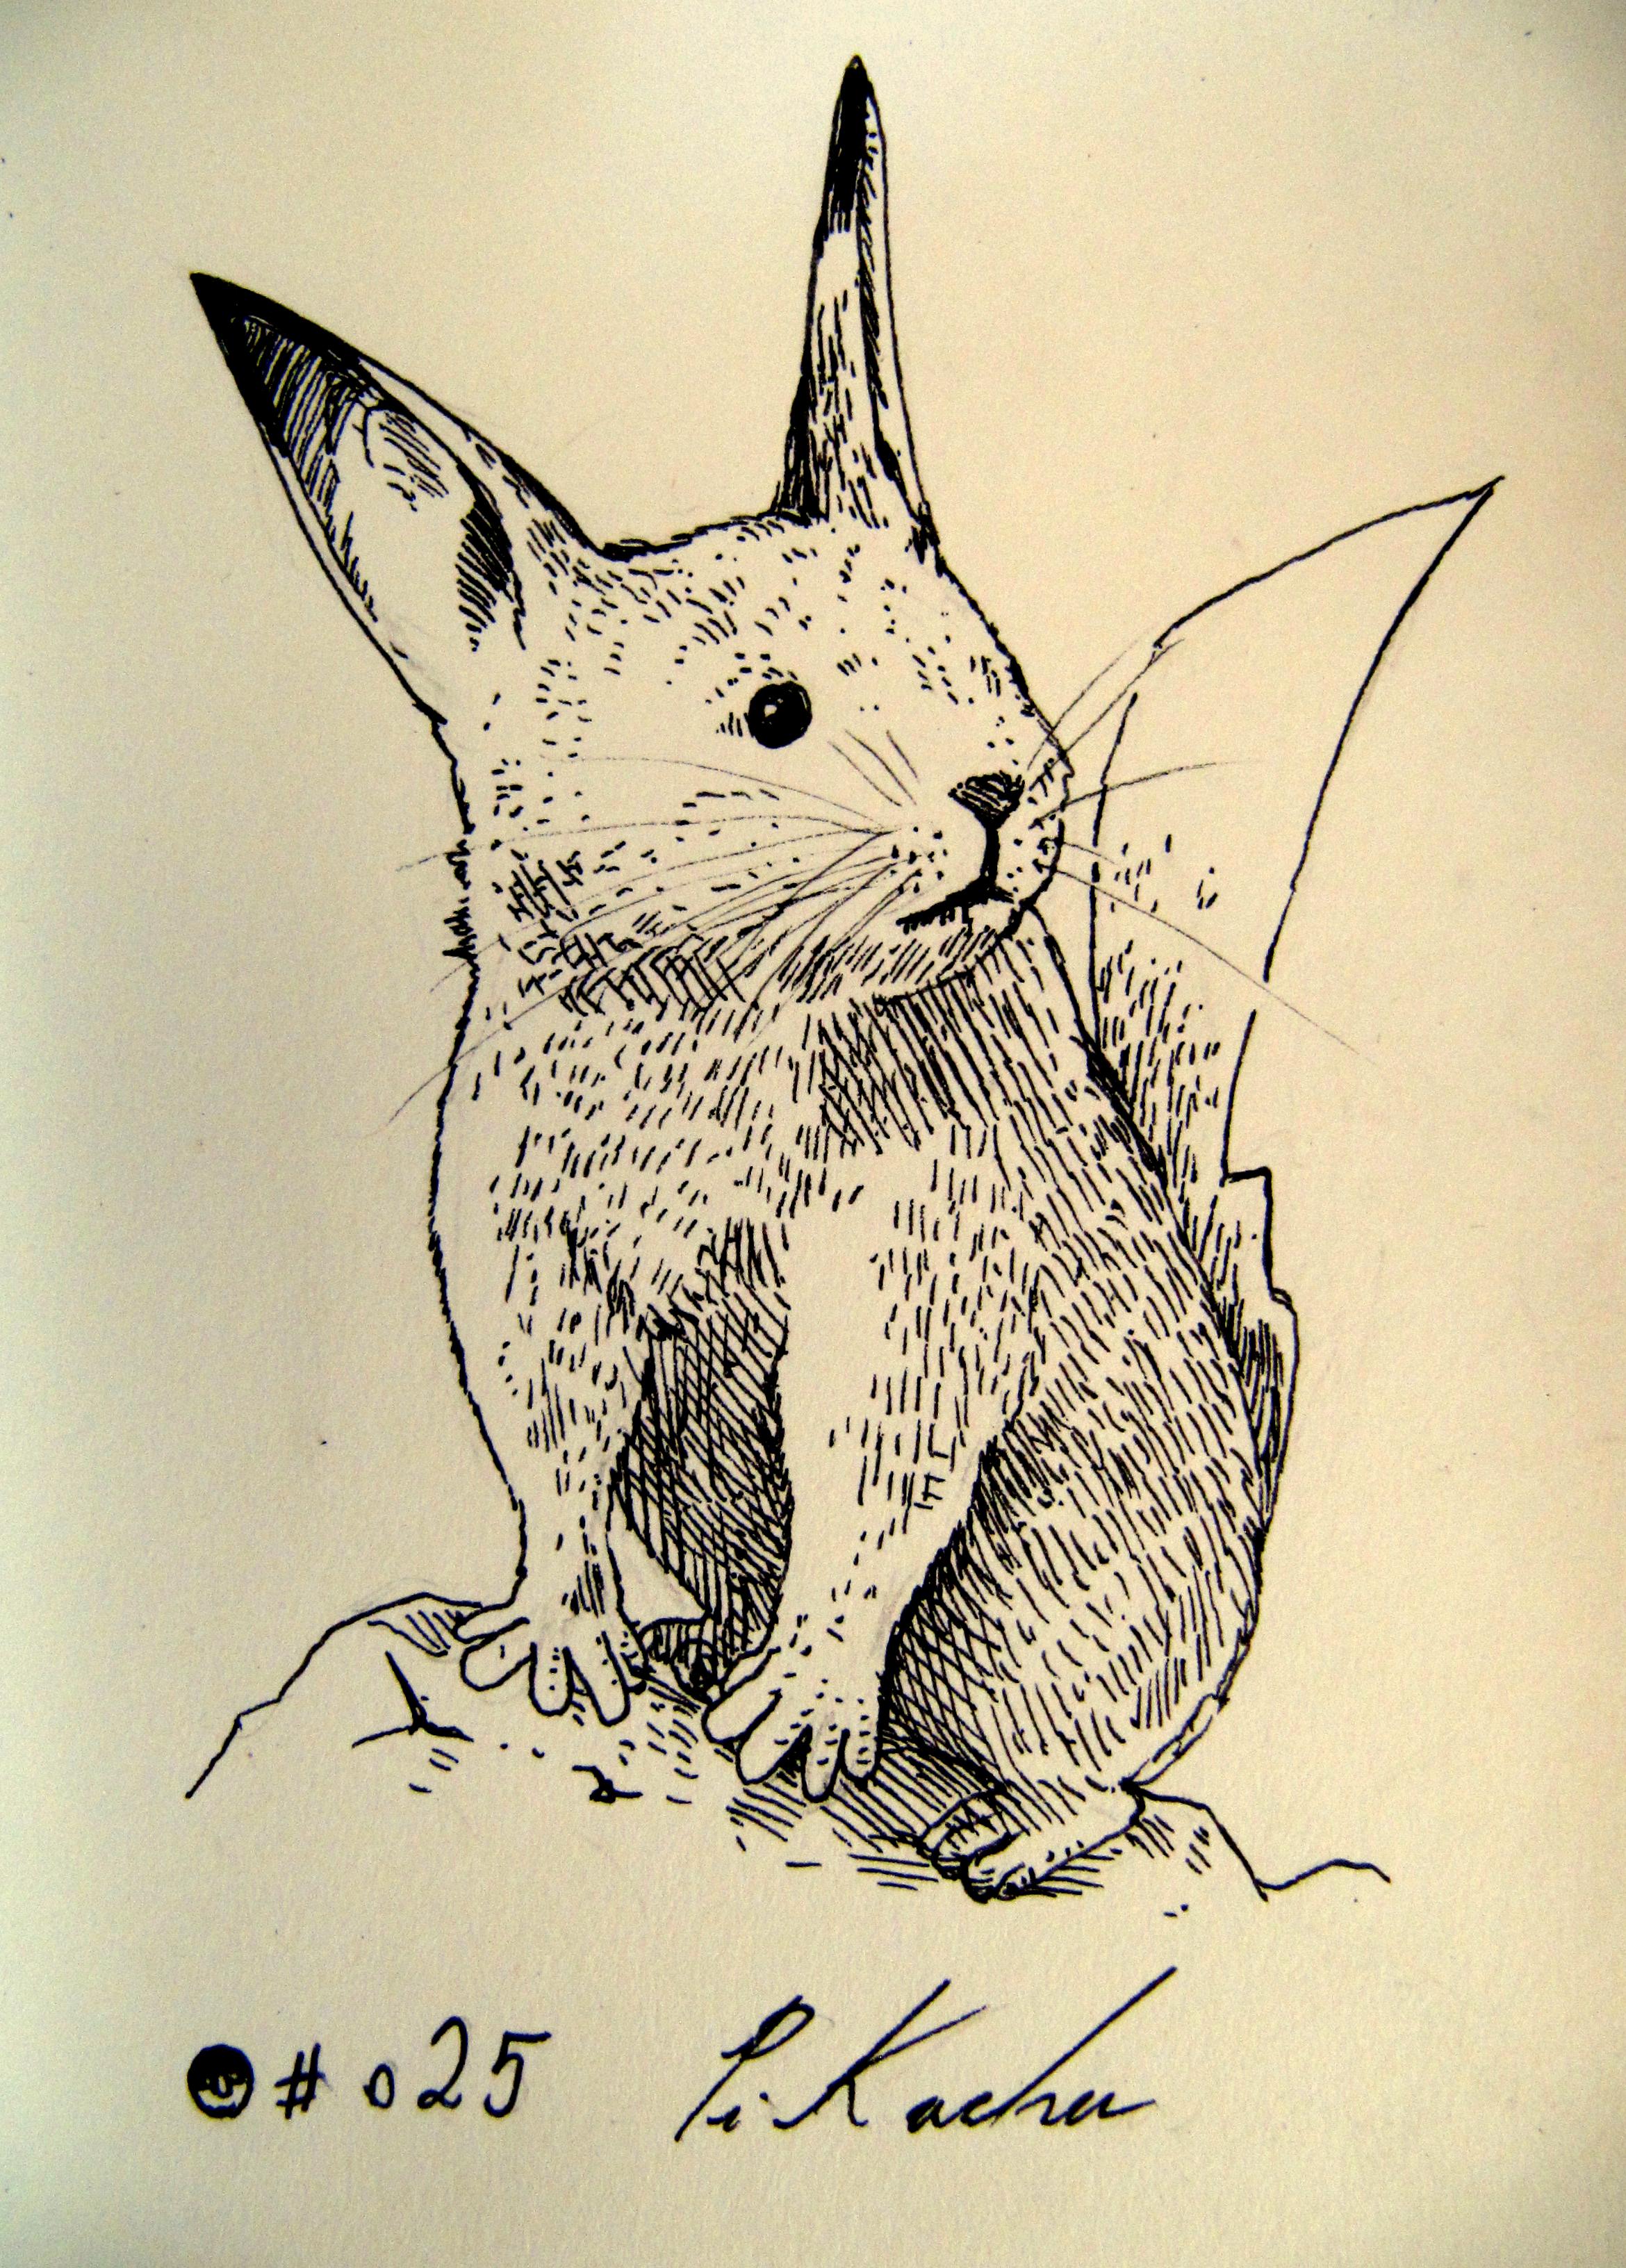 #025_Pikachu